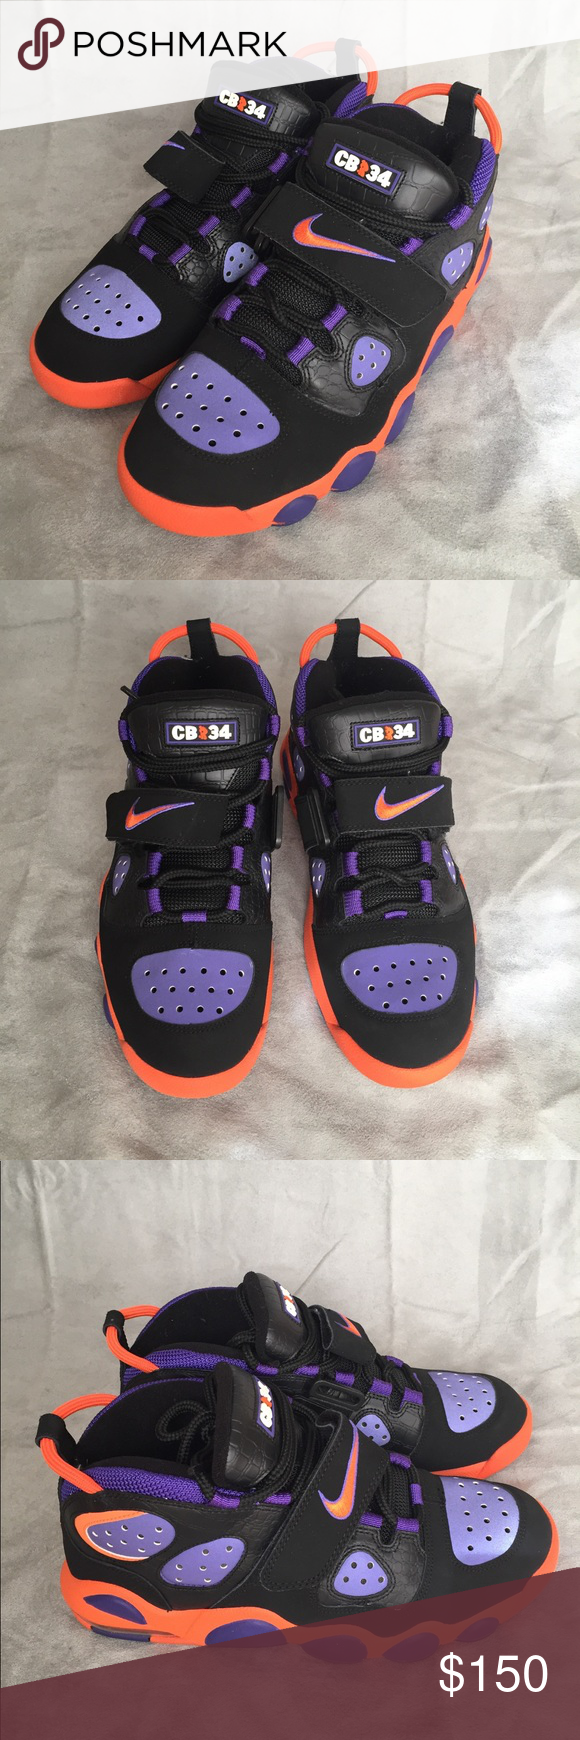 newest 61171 b9806 Nike Air CB 34 Phoenix Suns RARE Size 10 Nike Air CB 34 Phoenix Suns RARE